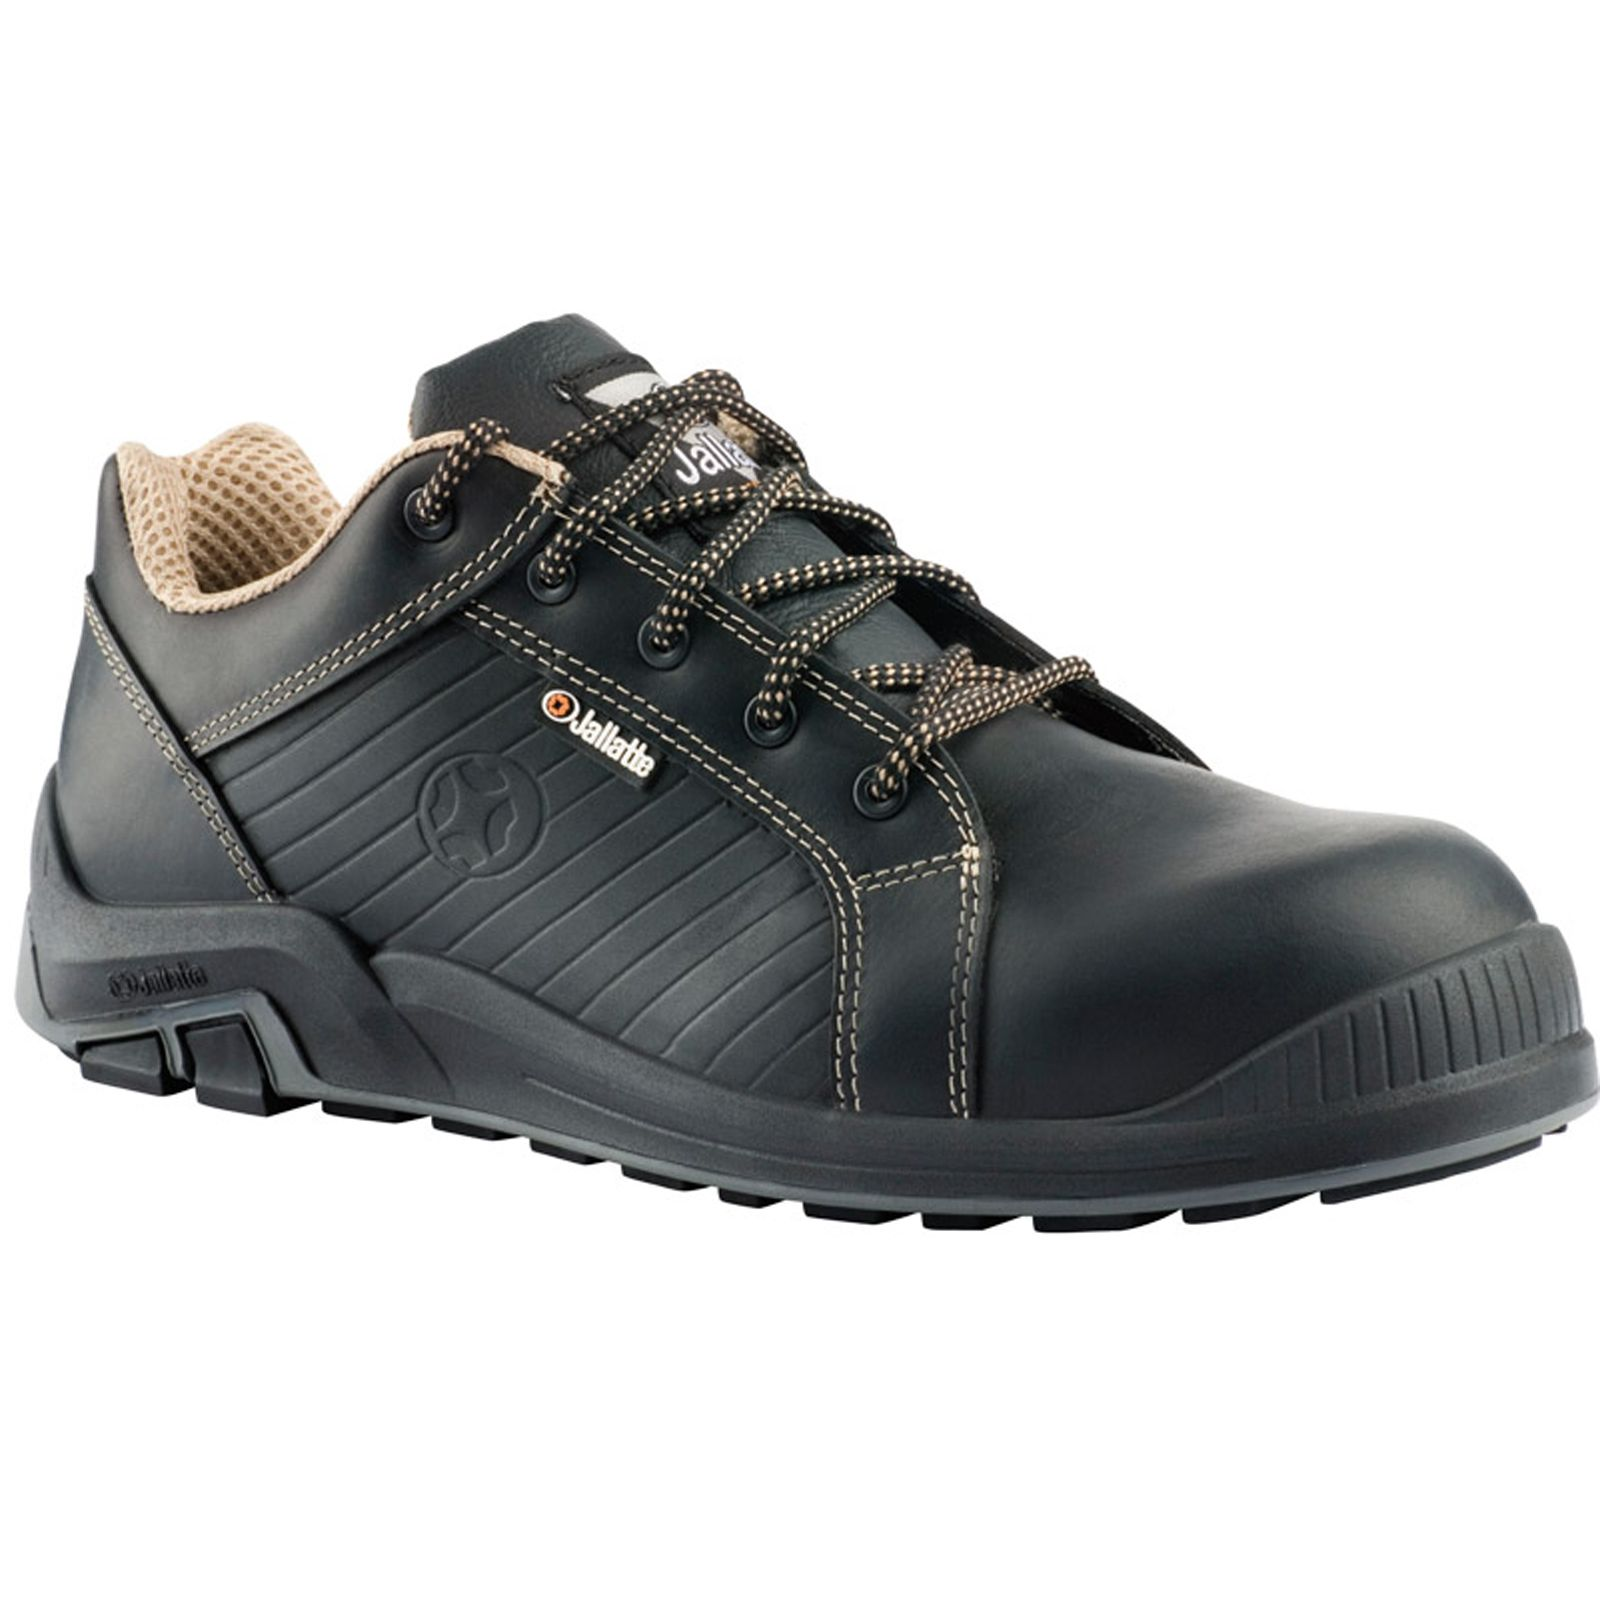 Src Sécurité Ci Chaussures Hro Jalfoxbat S3 Jallatte X2 De f0axqa7U